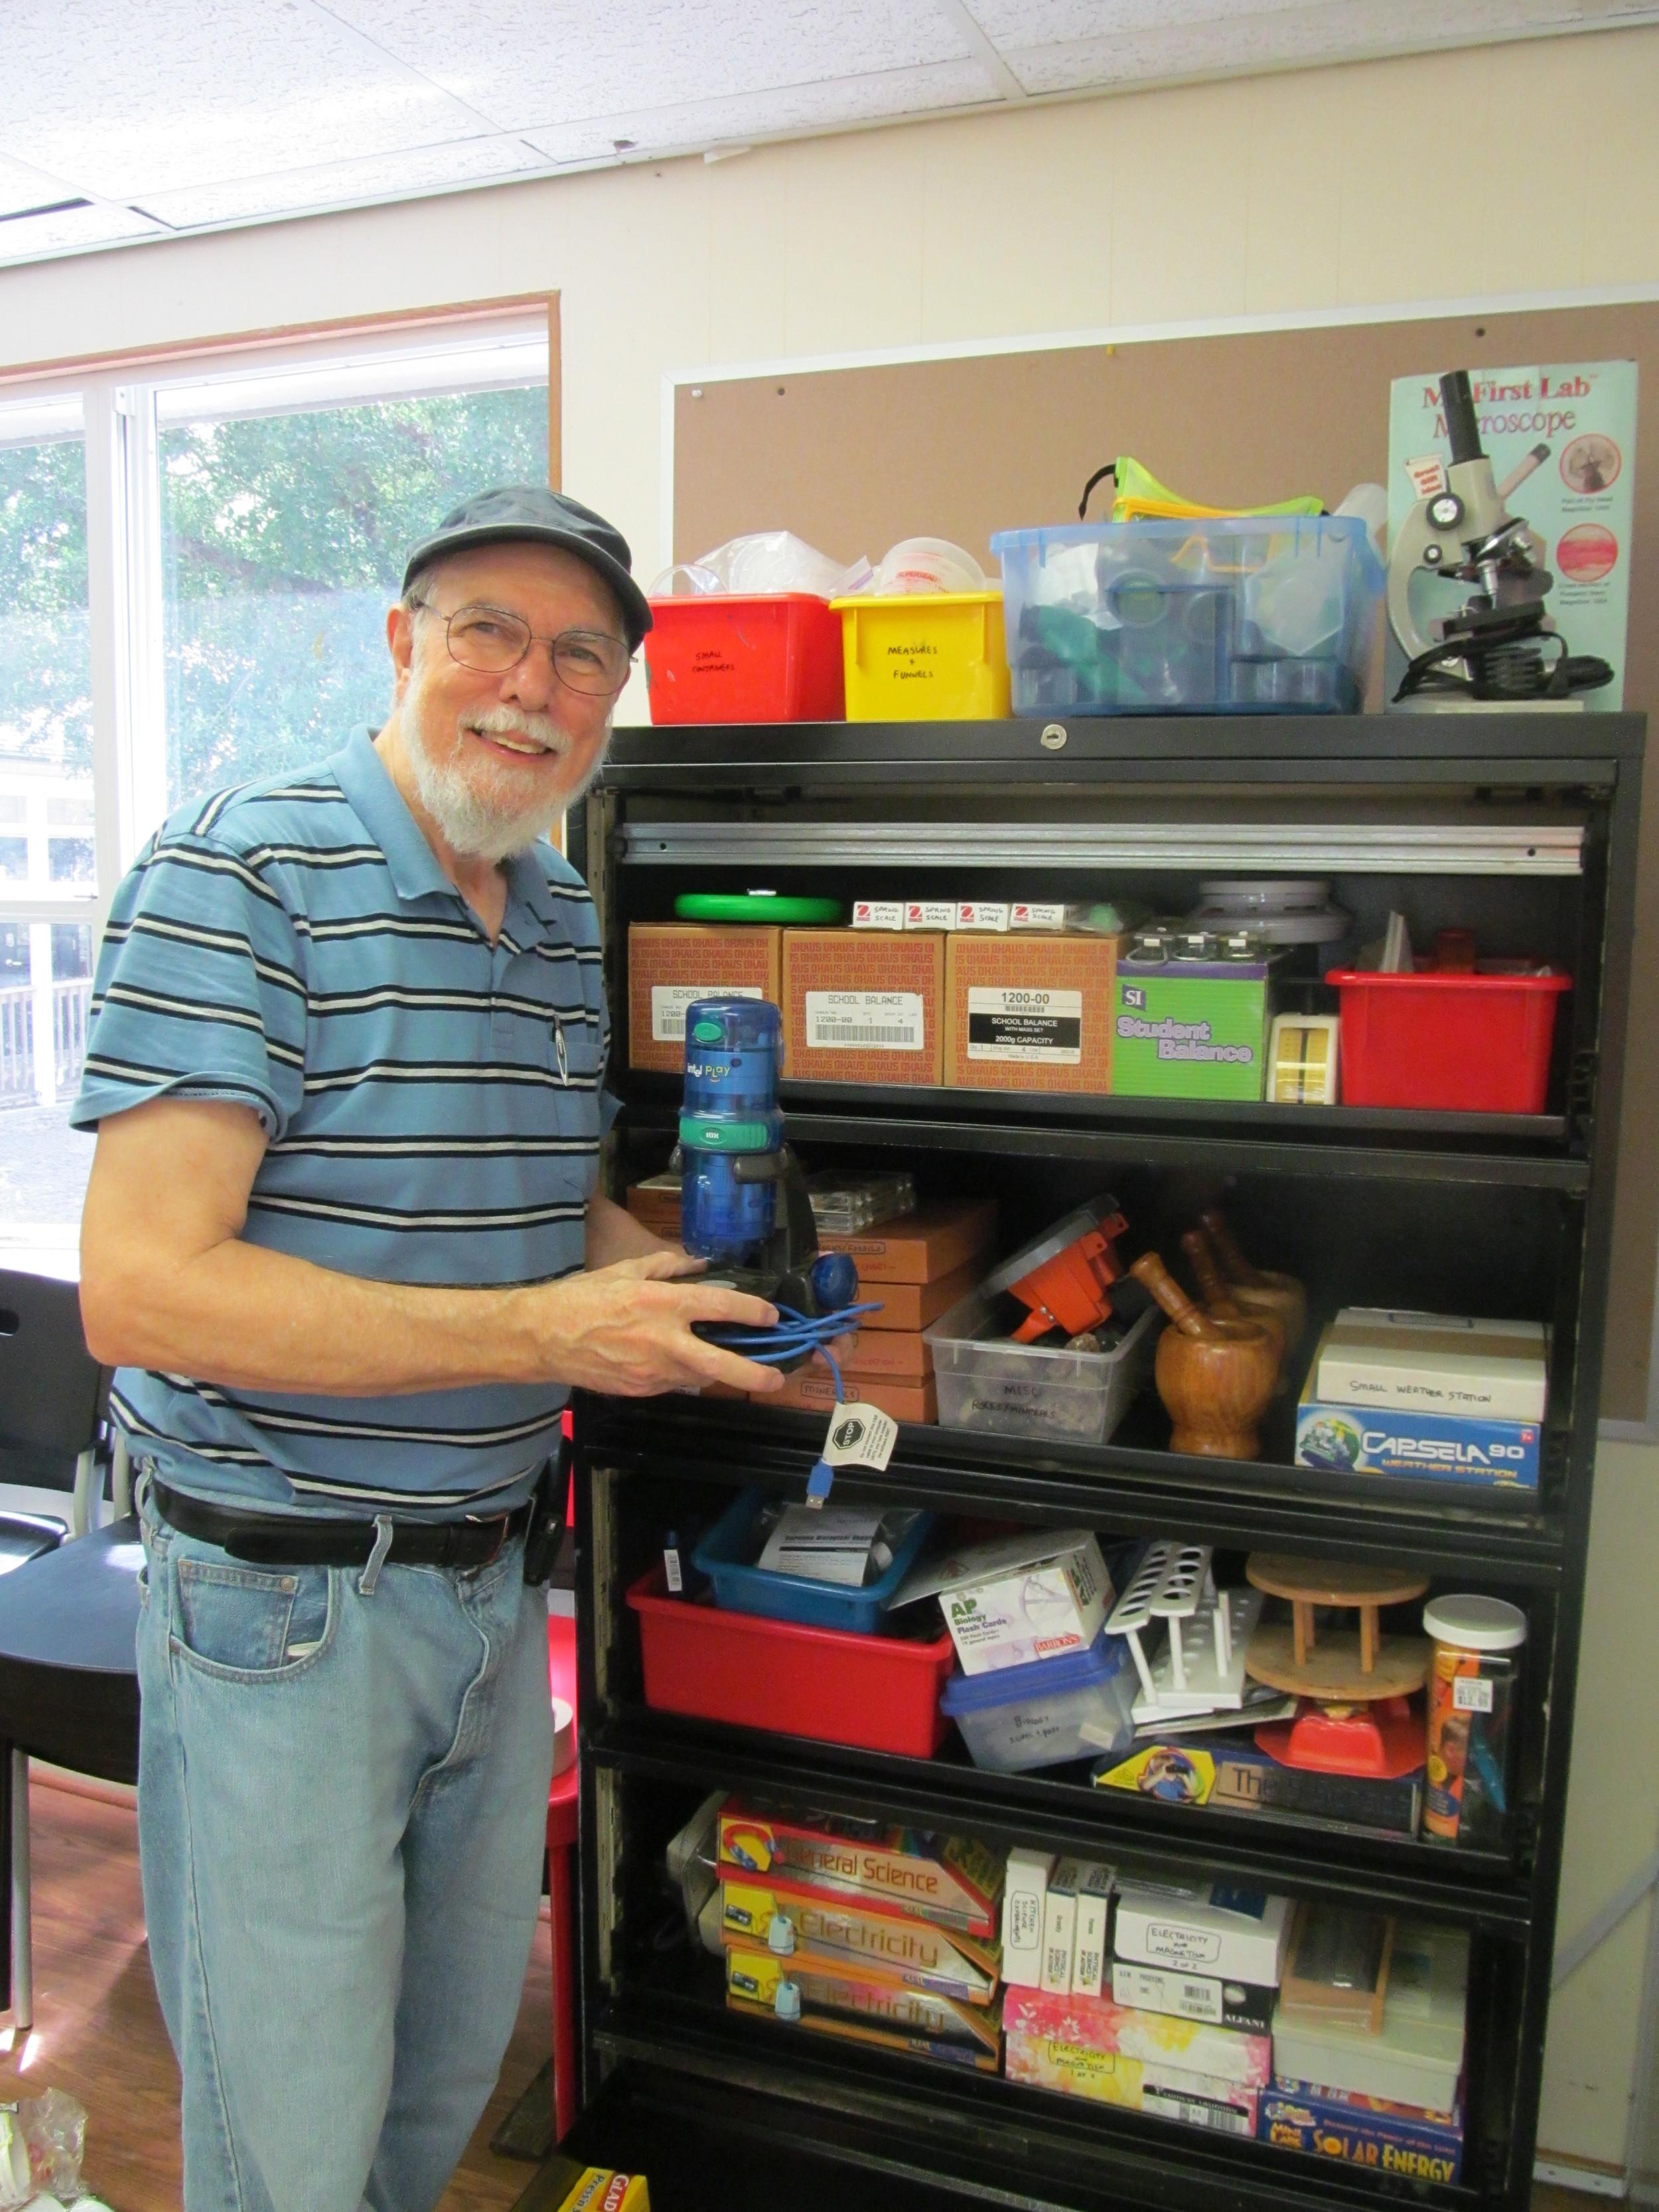 Dr. Bob, community advisor, gets the science lab equipment ready.